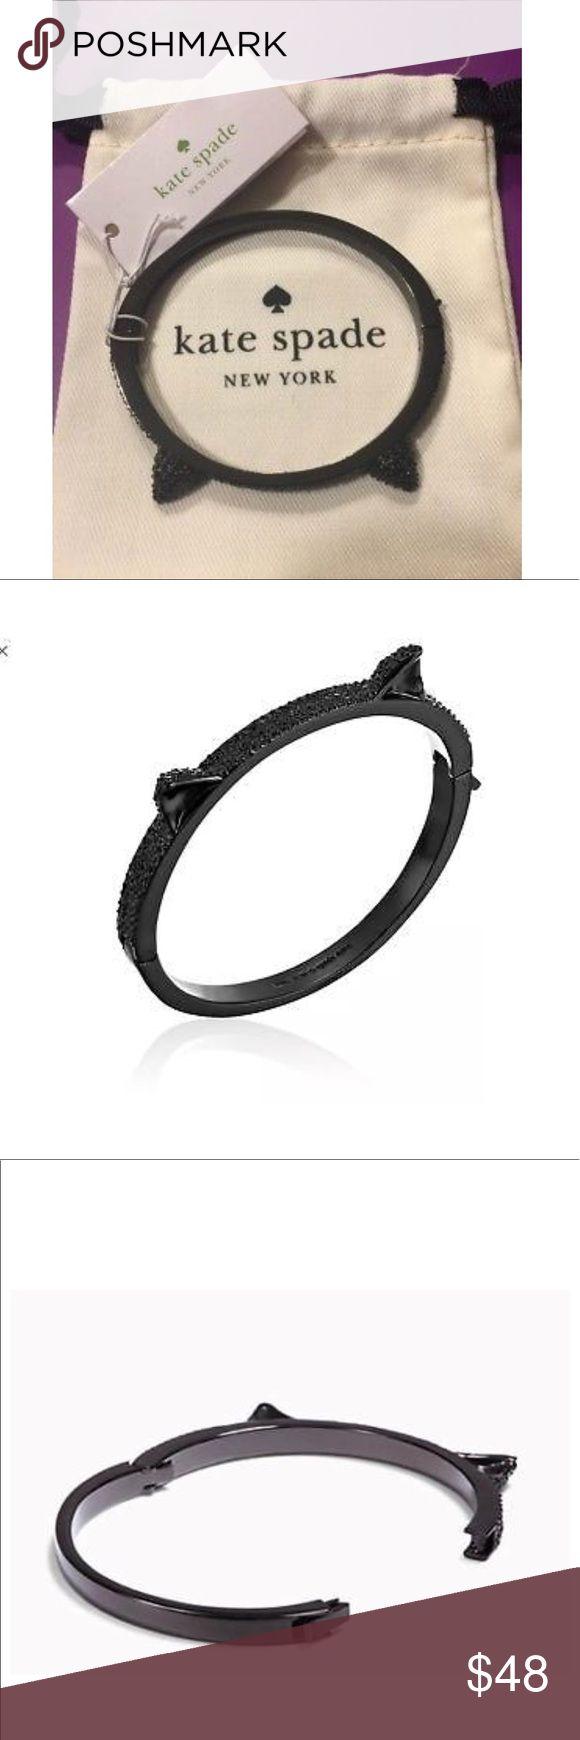 "Kate spade cat bangle bracelet Beautiful Kate Spade pave cat ear bangle bracelet made from dark black crystals . Inside diameter measures 2 1/2"". kate spade Jewelry Bracelets"